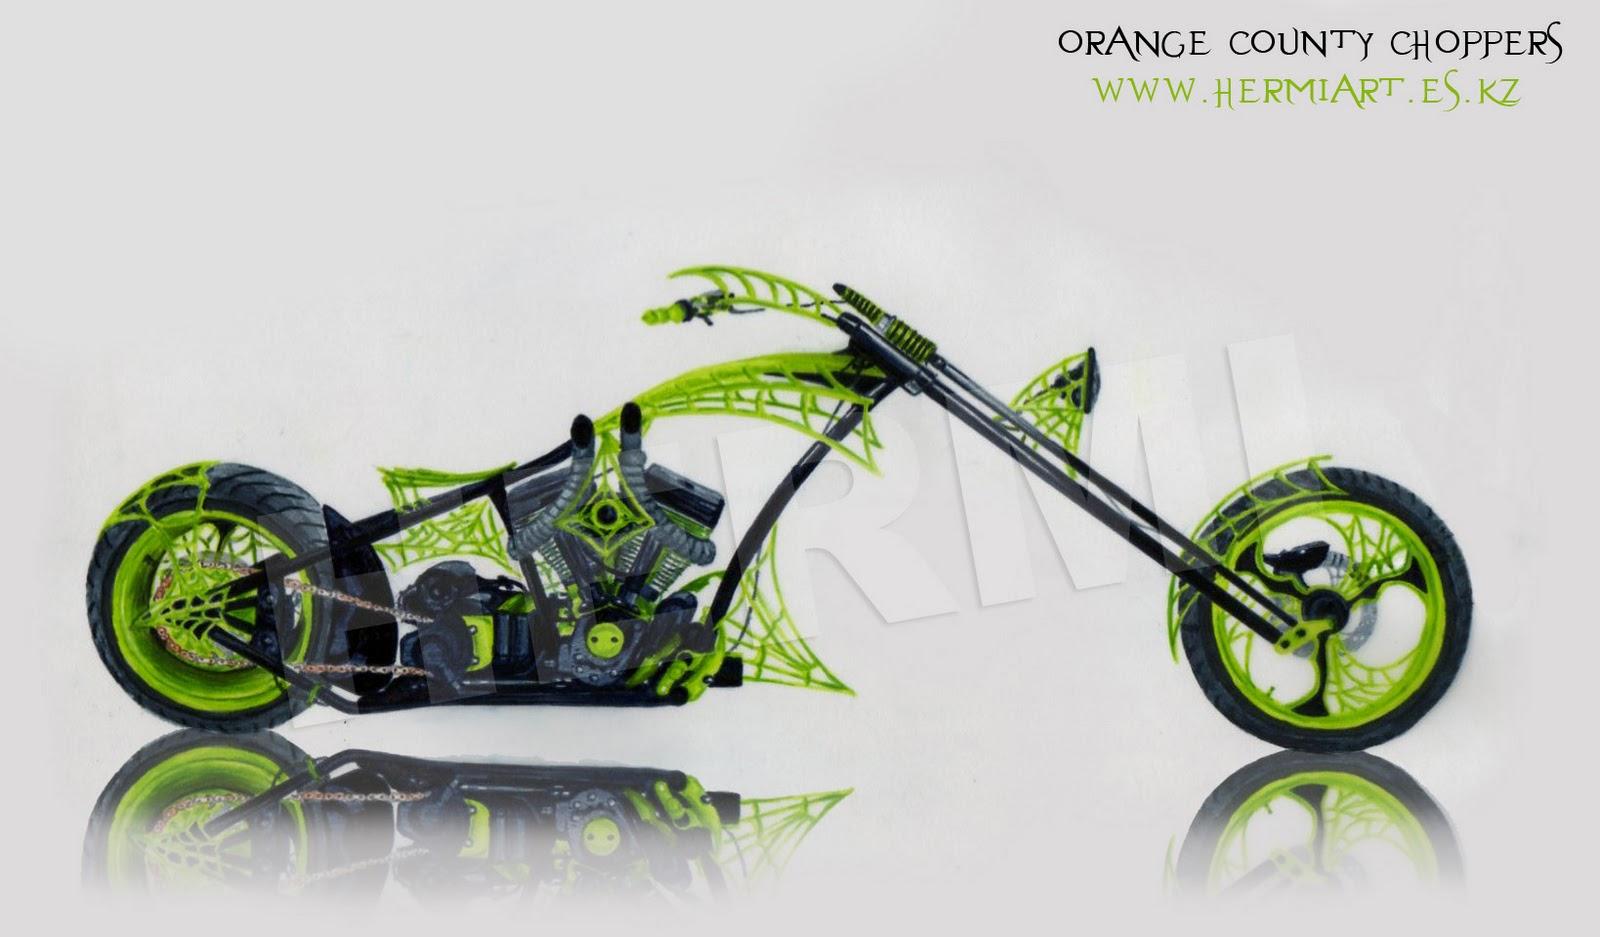 1600x937 Motorcycle Chopper Wallpaper Wallpaper For Desktop